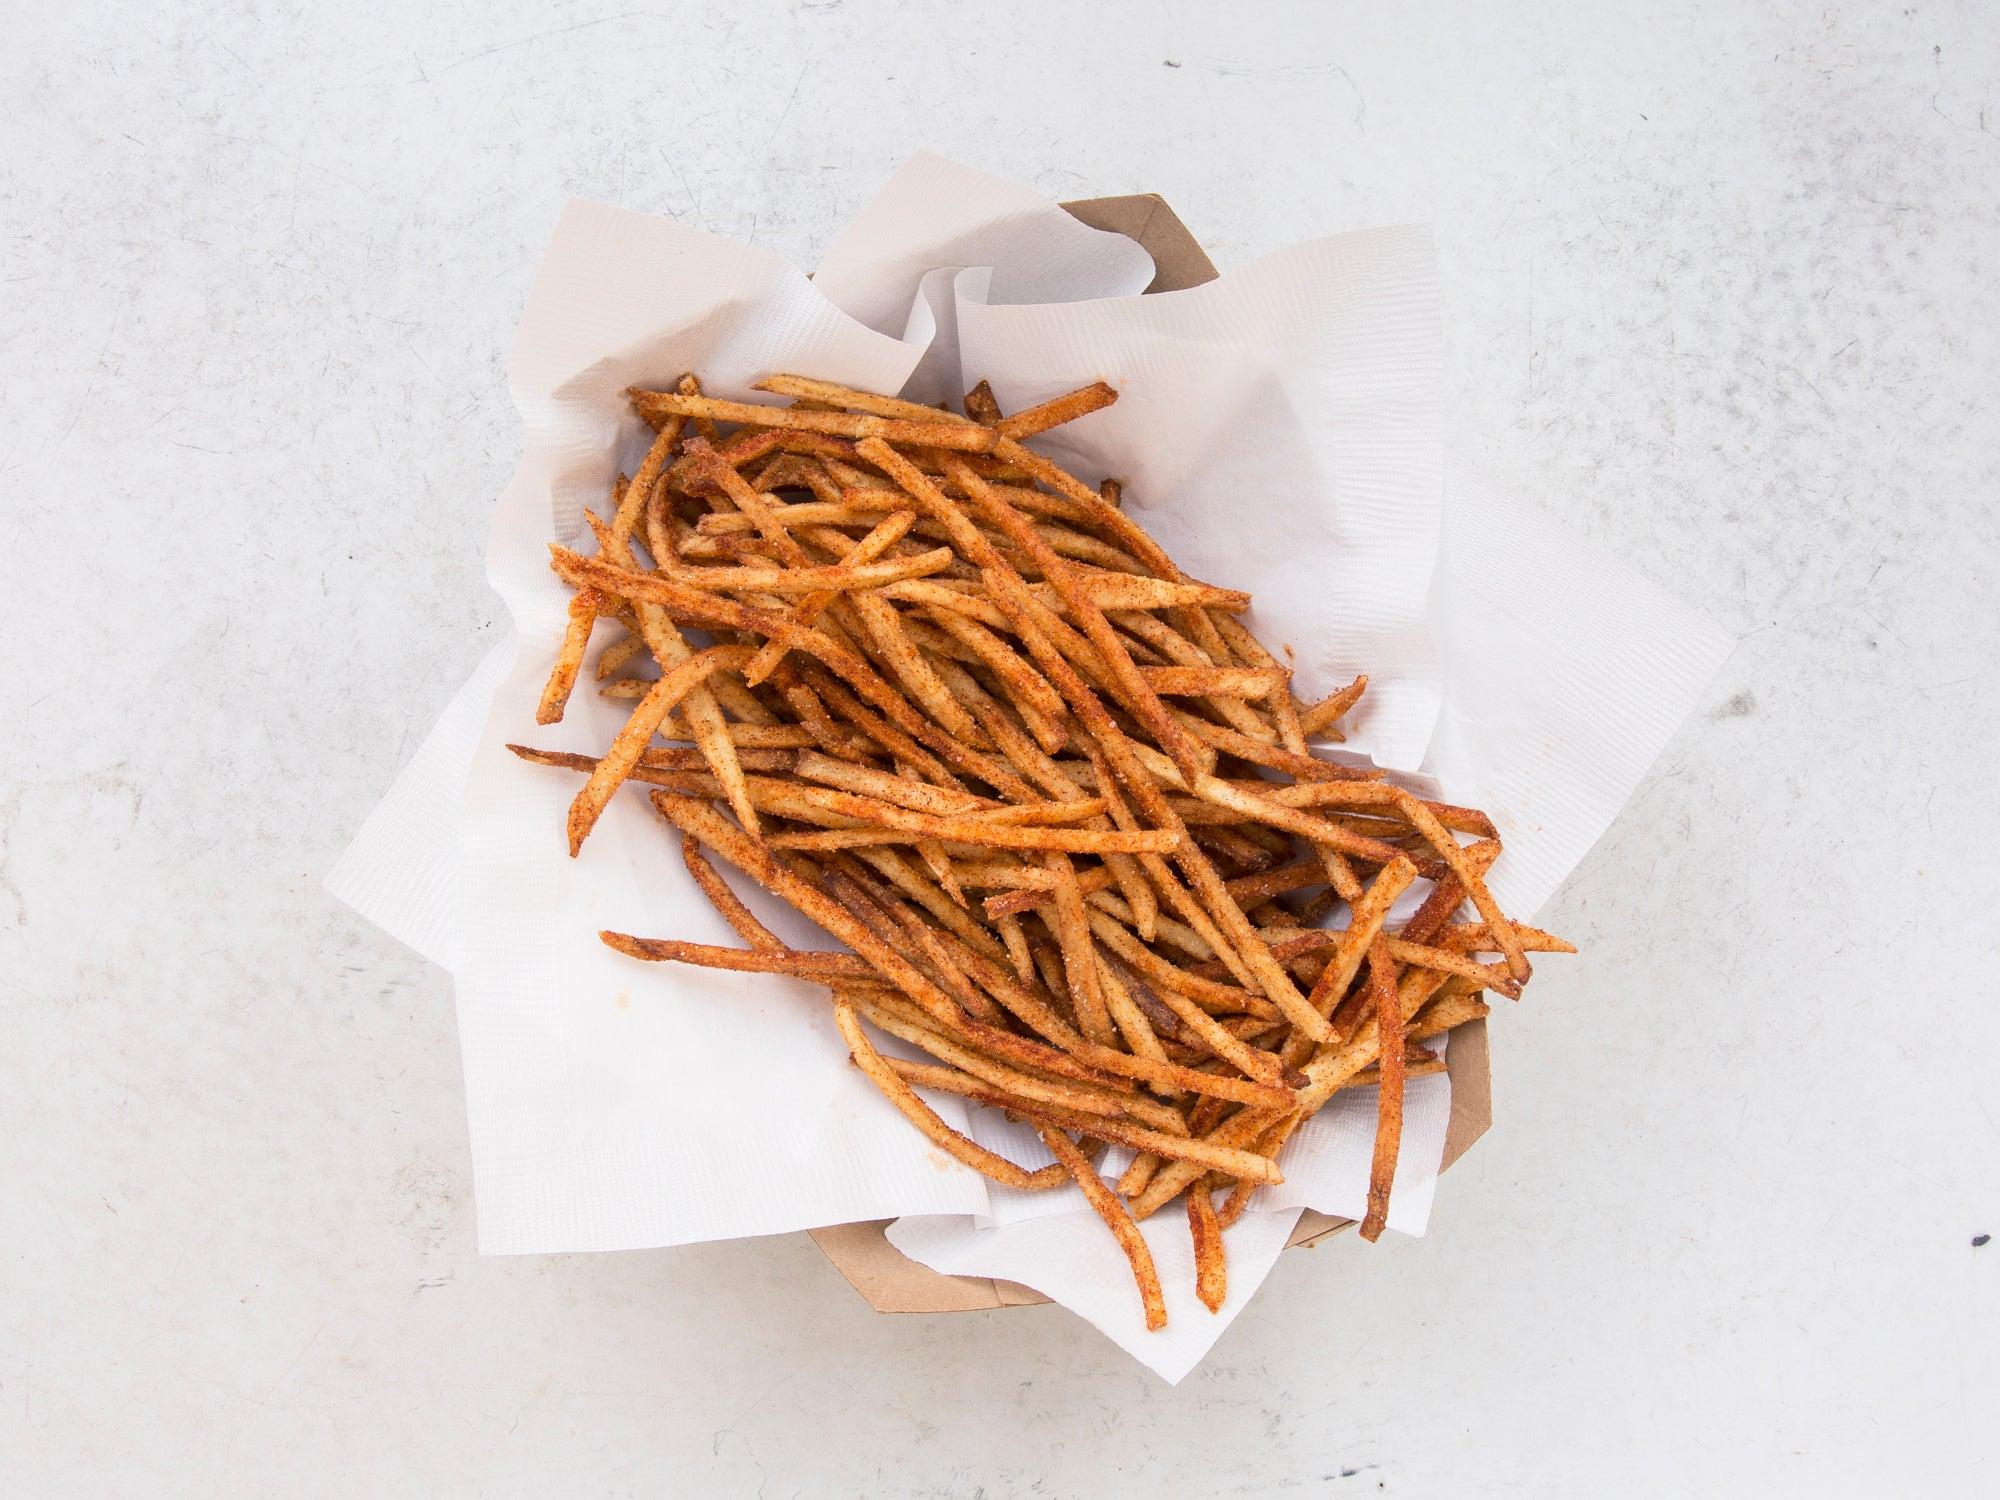 Homemade Hot Fries